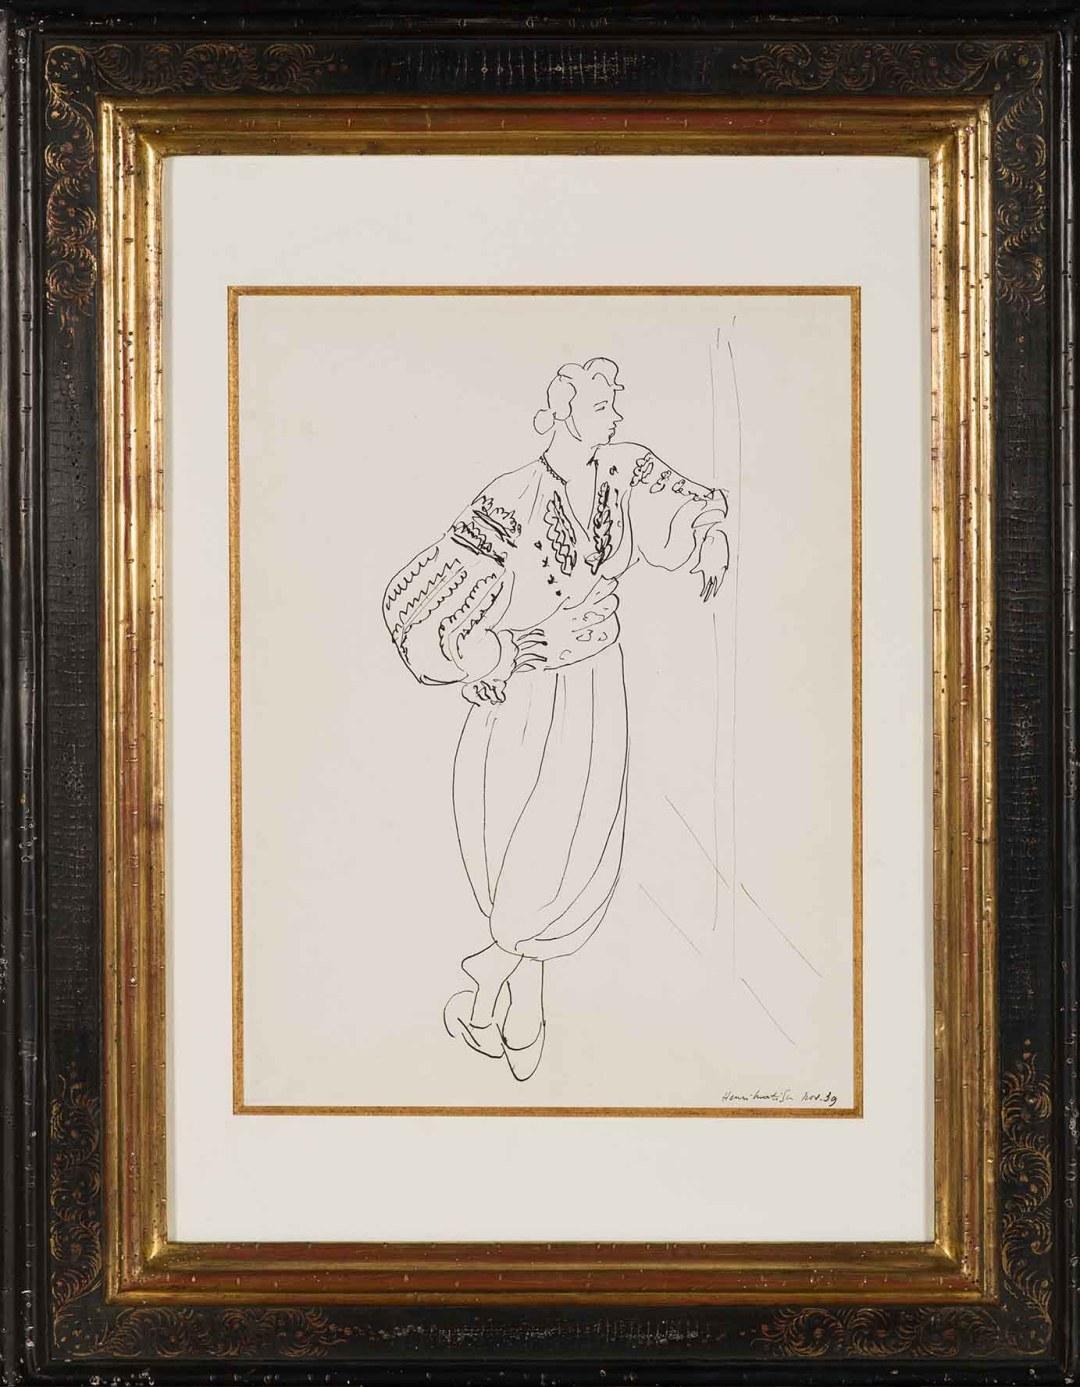 Henri MATISSE | 51 x 63 cm